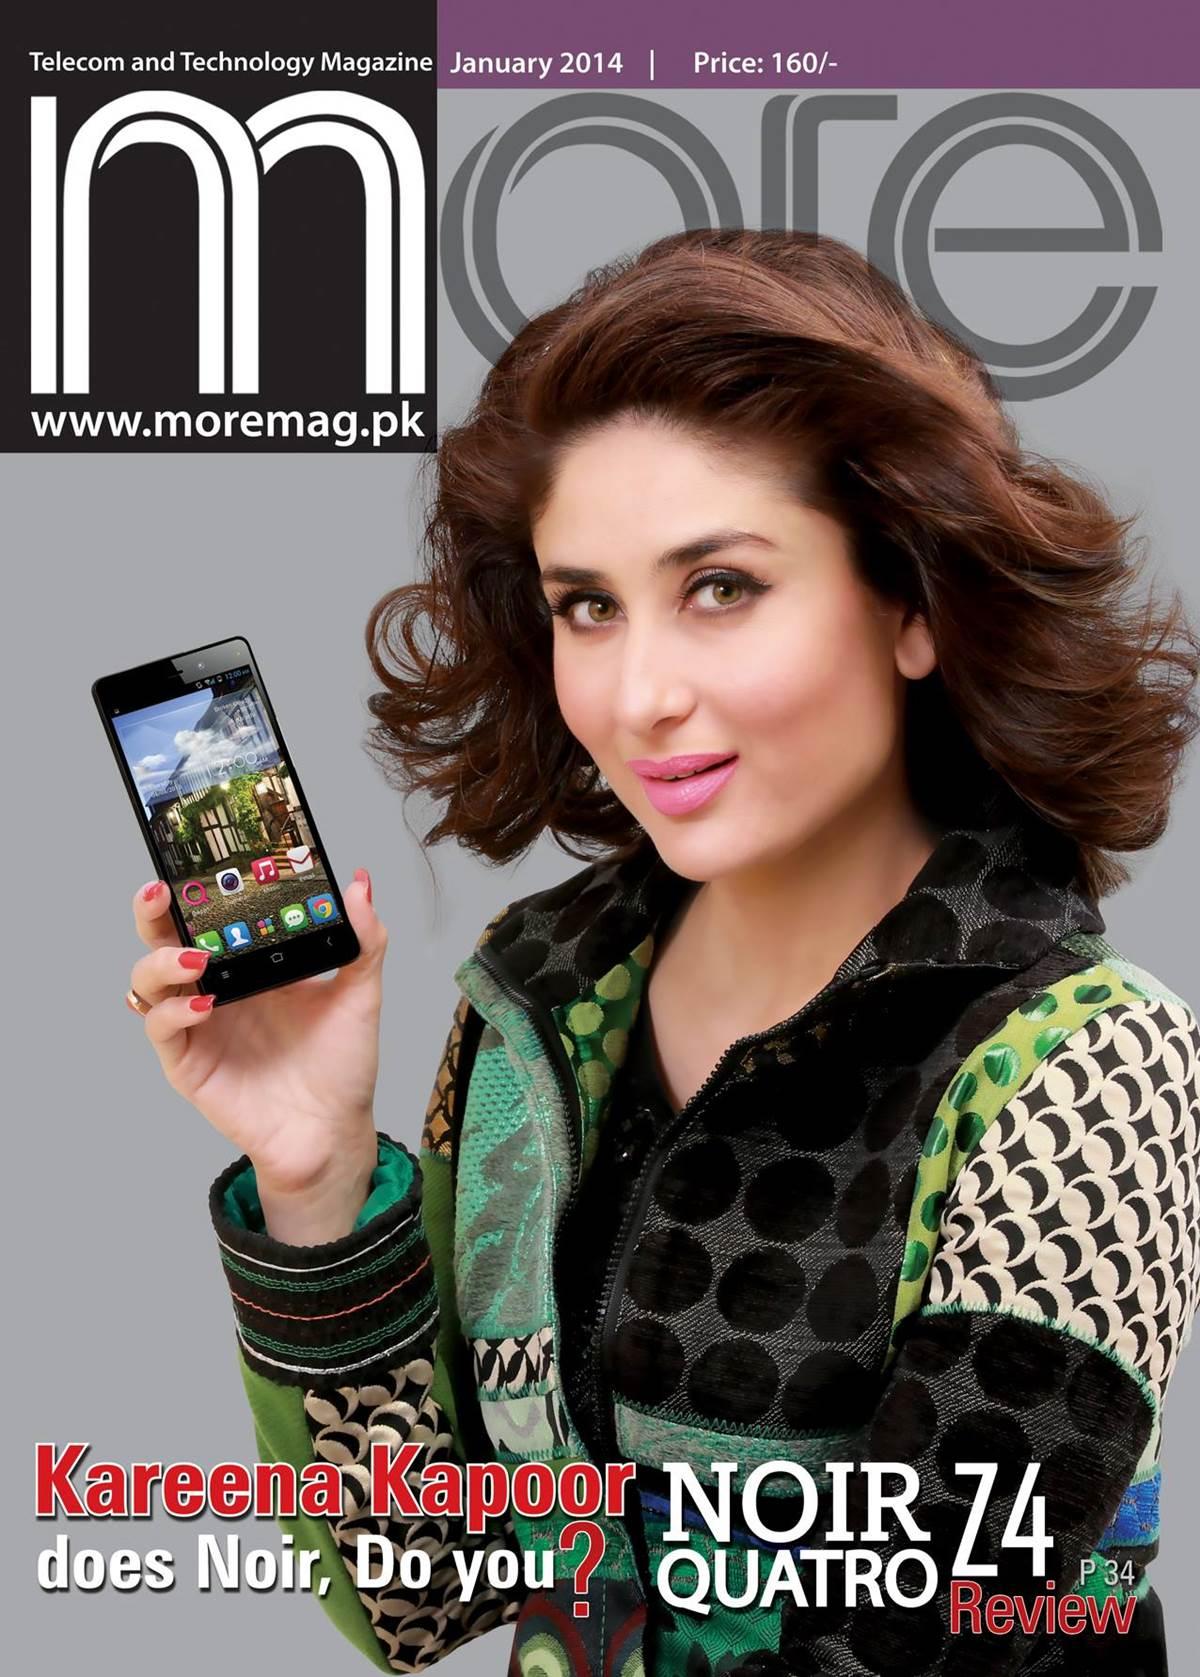 More Magazine November 2014 Issue: Kareena Kapoor More Magazine Cover